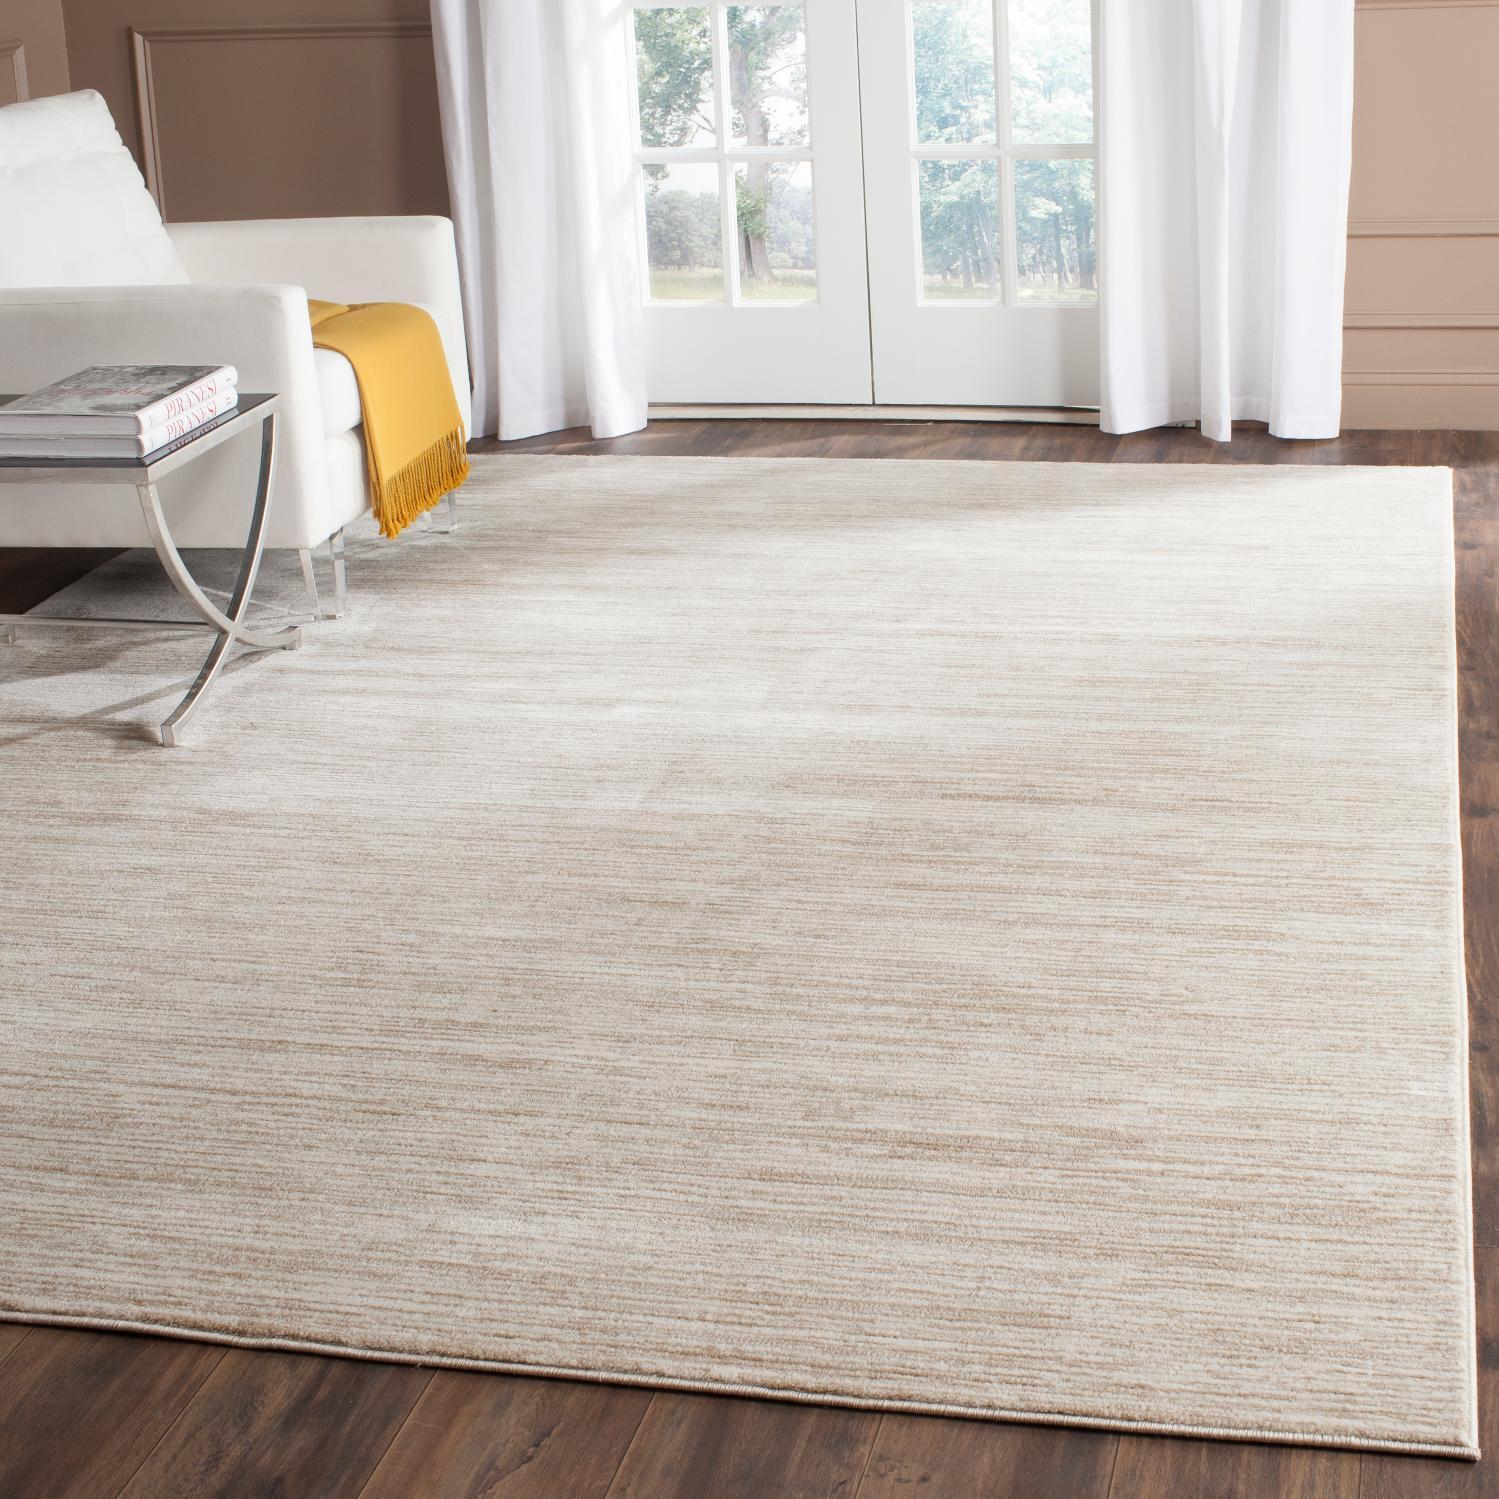 large rugs safavieh valentine rug sticker WBTOEYJ